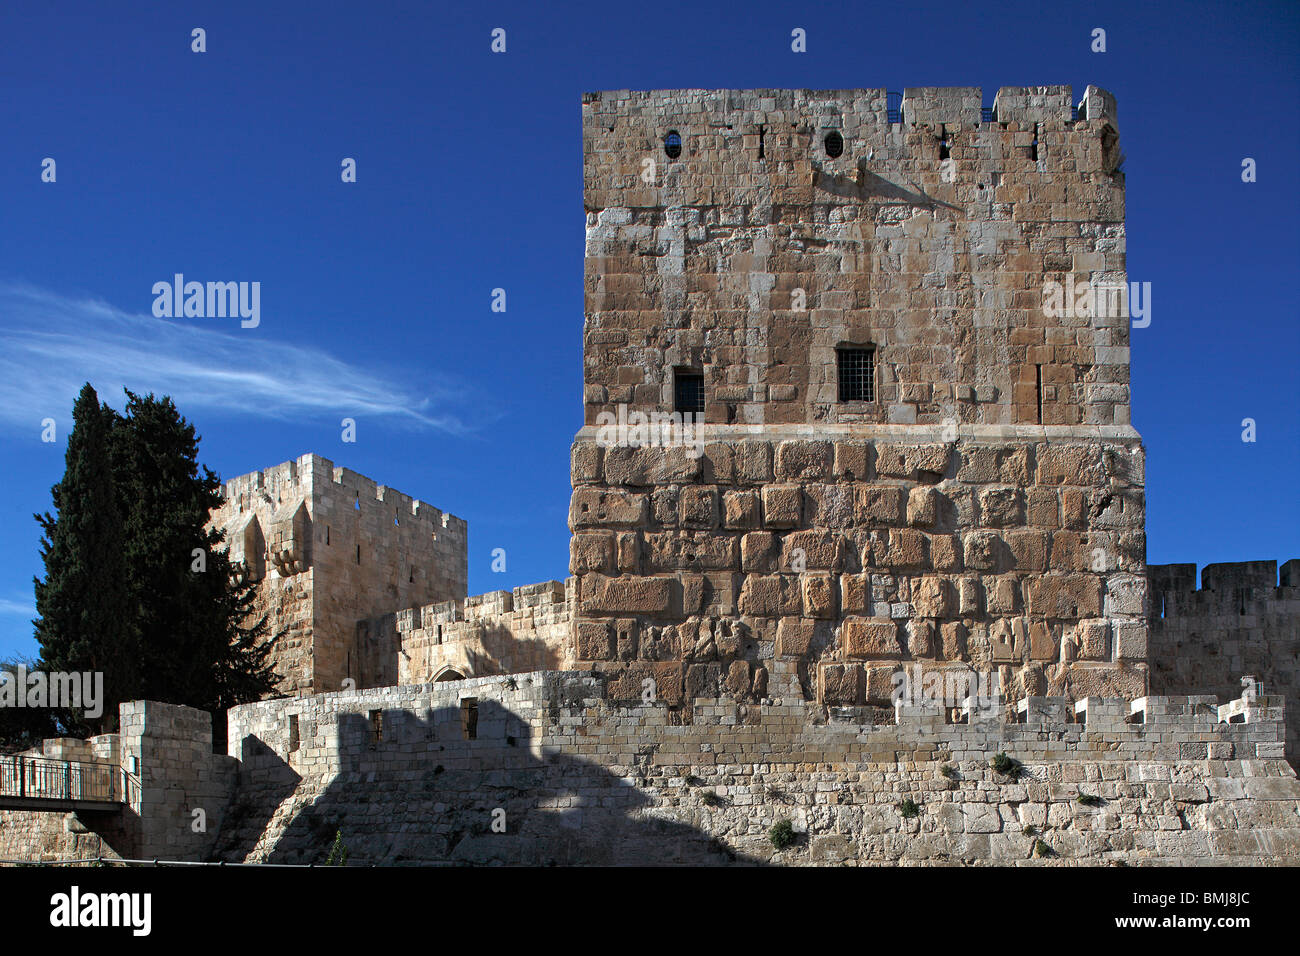 Israel,Jerusalem,Old city,Citadel,David's Tower - Stock Image